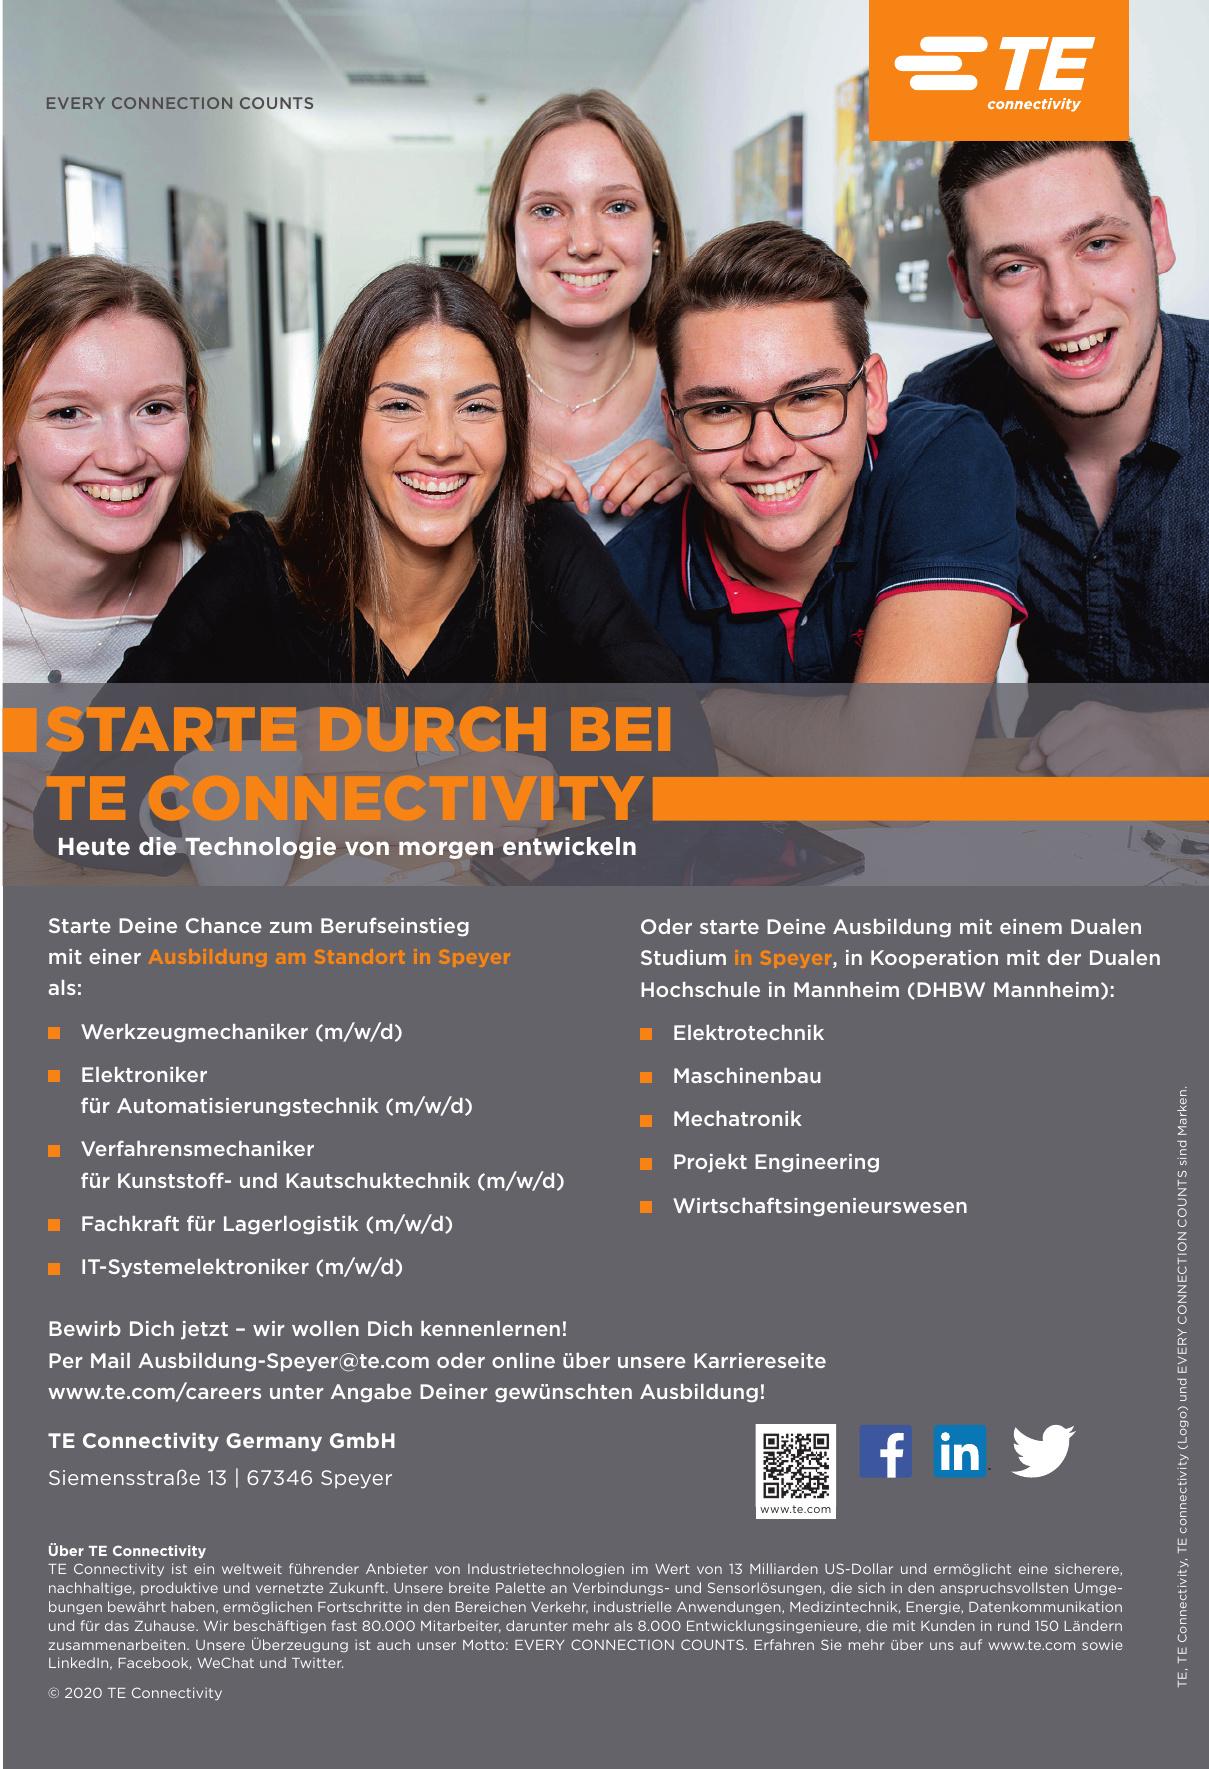 TE Connectivity Germany GmbH